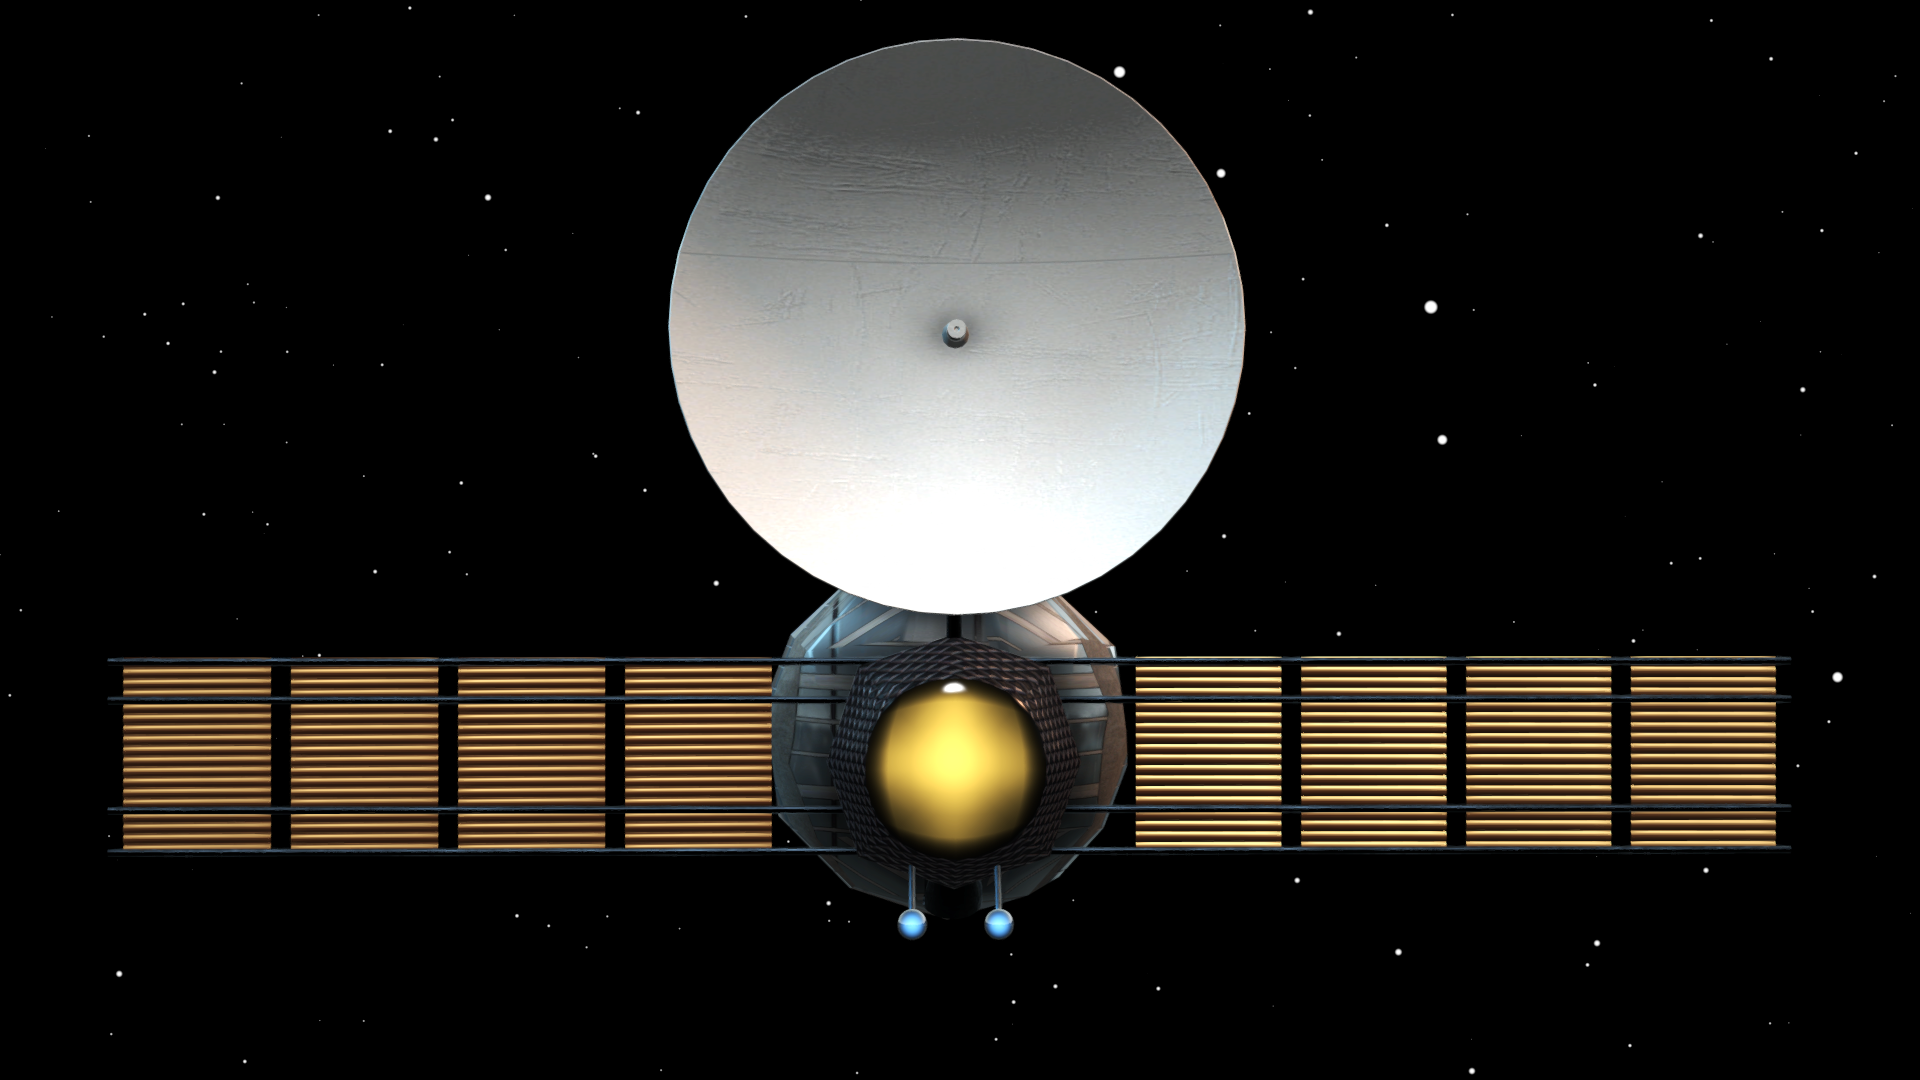 space probe models - photo #4